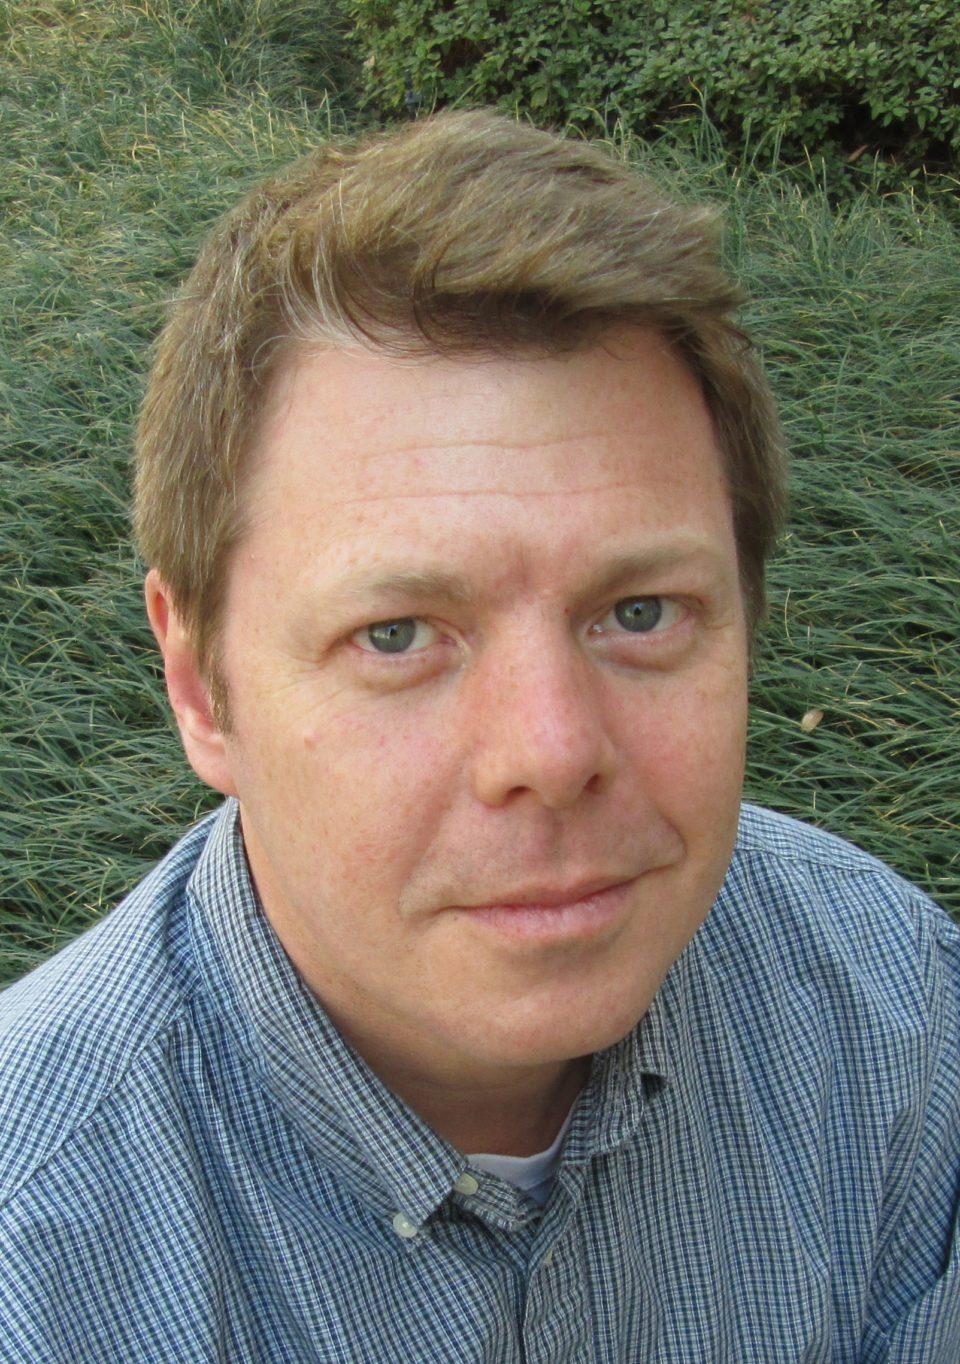 Andrew Walter - Wikipedia